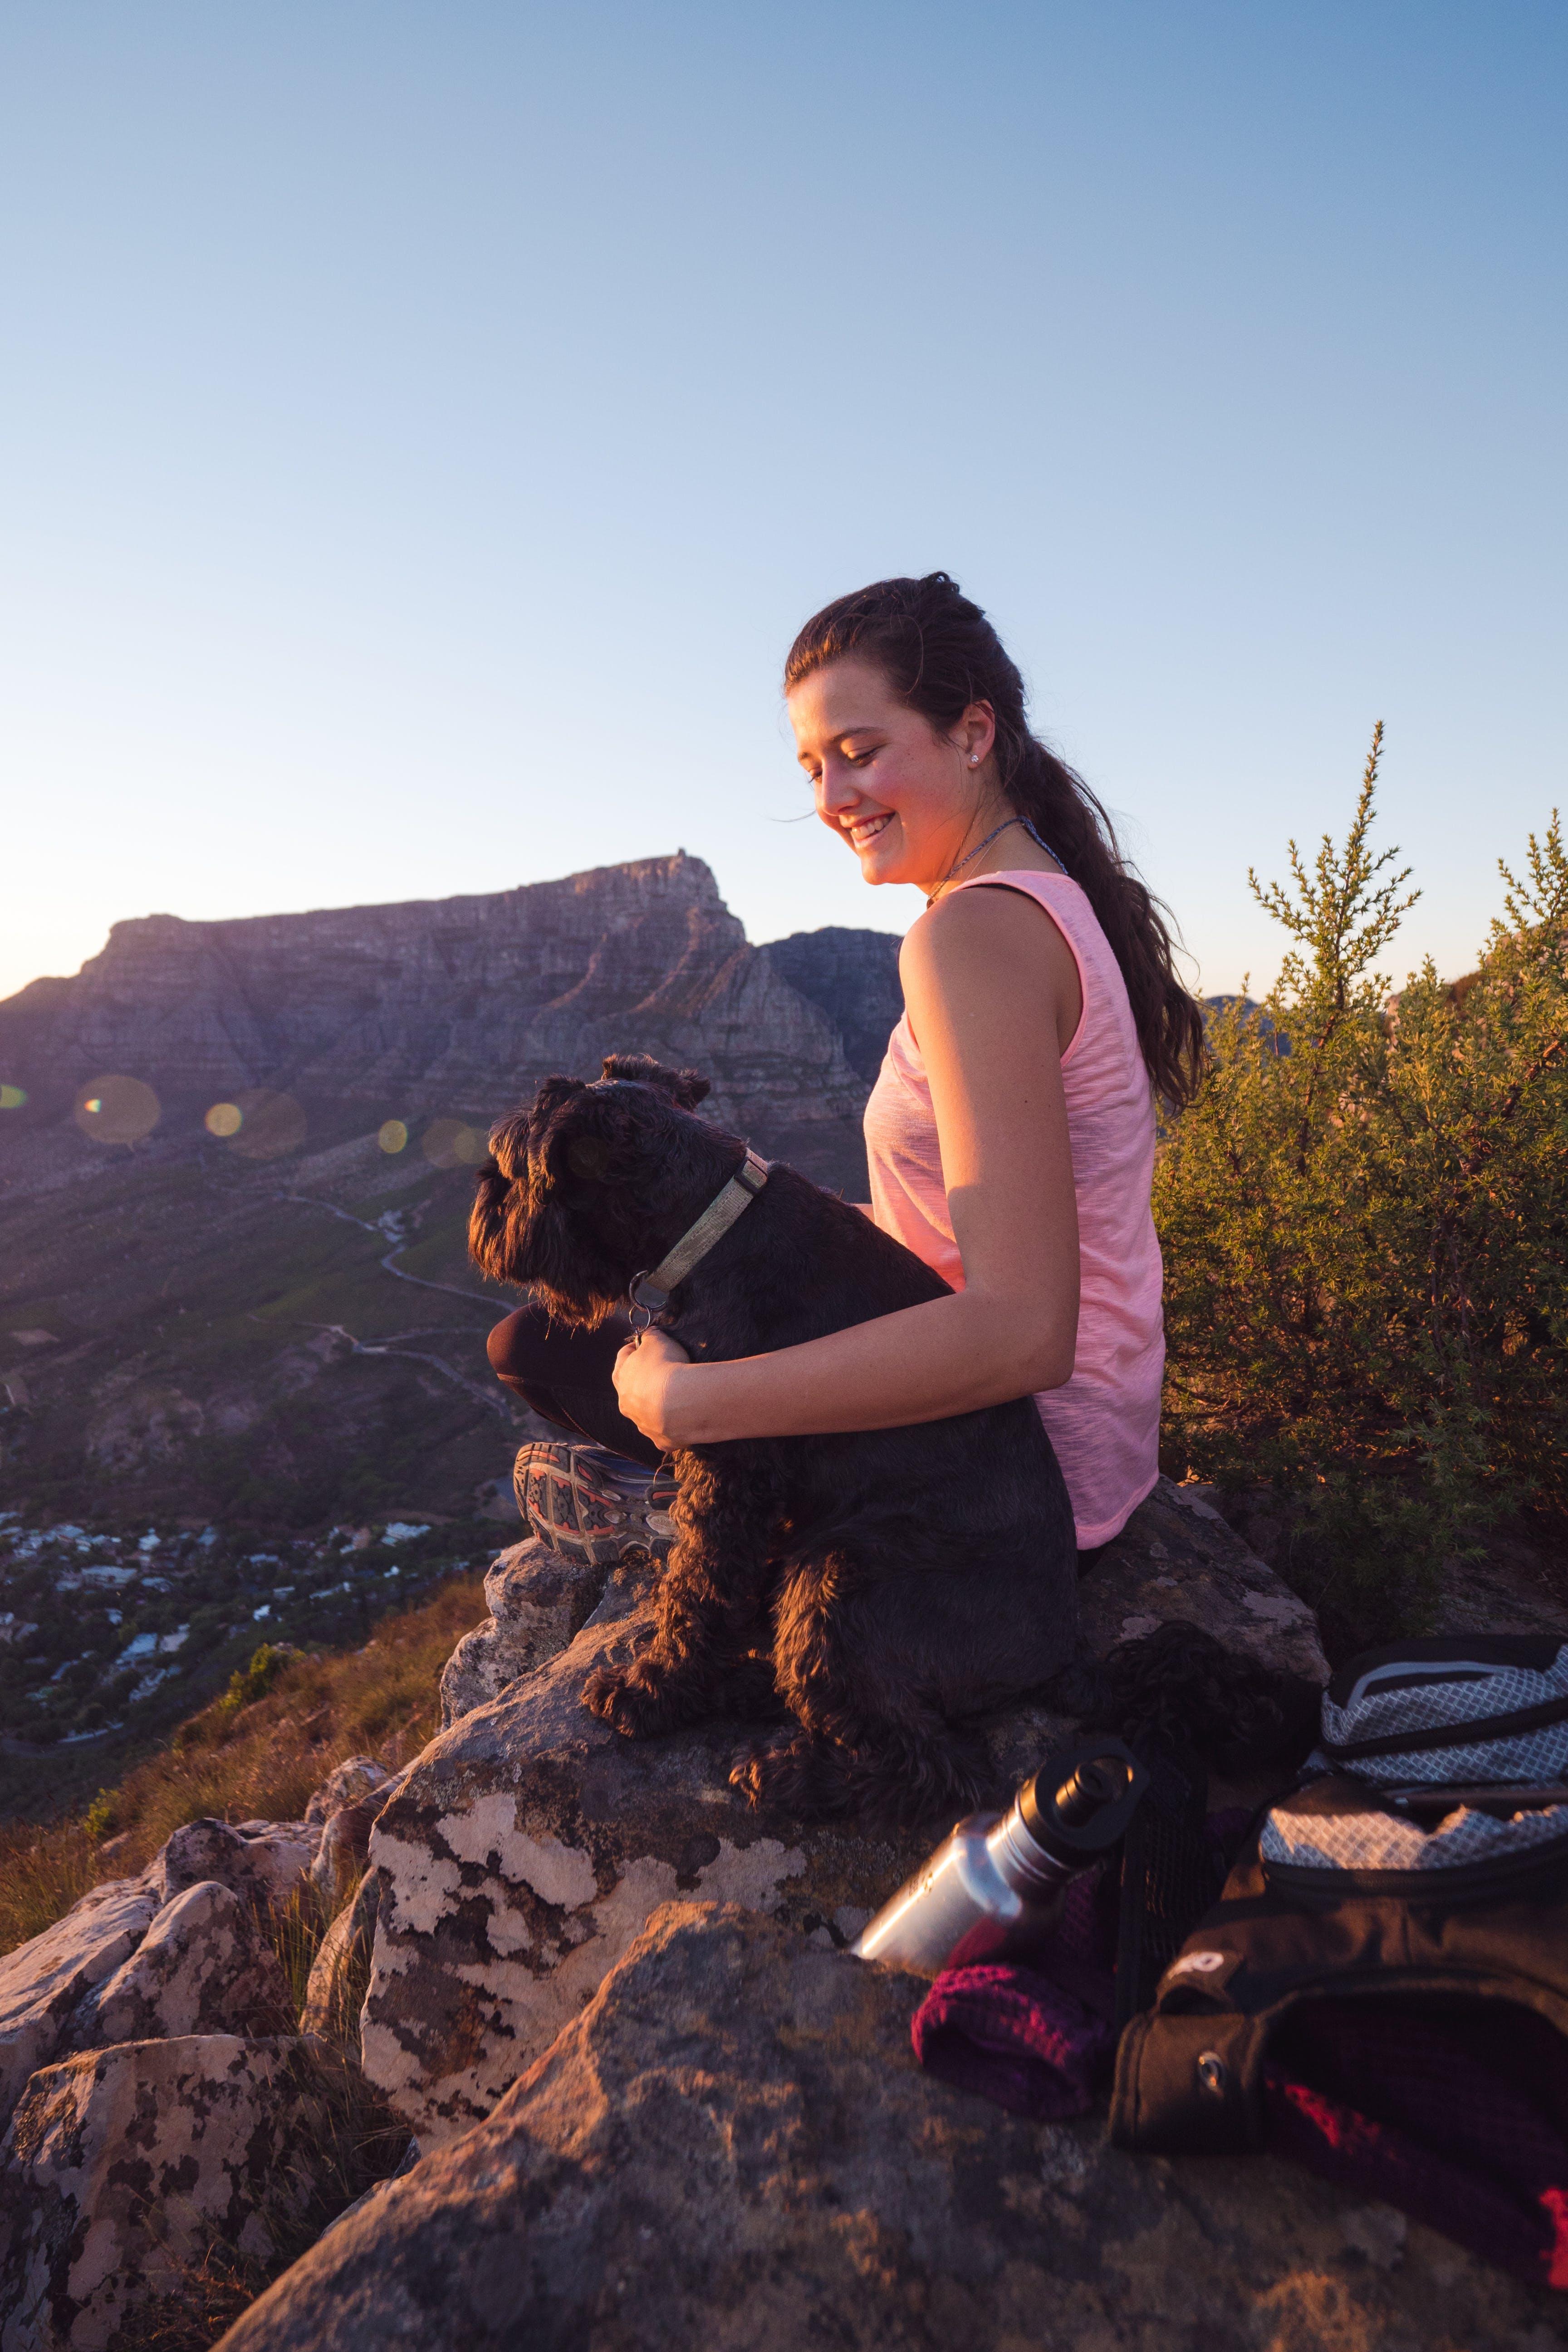 Fotos de stock gratuitas de animal, ascender, aventura, caminar